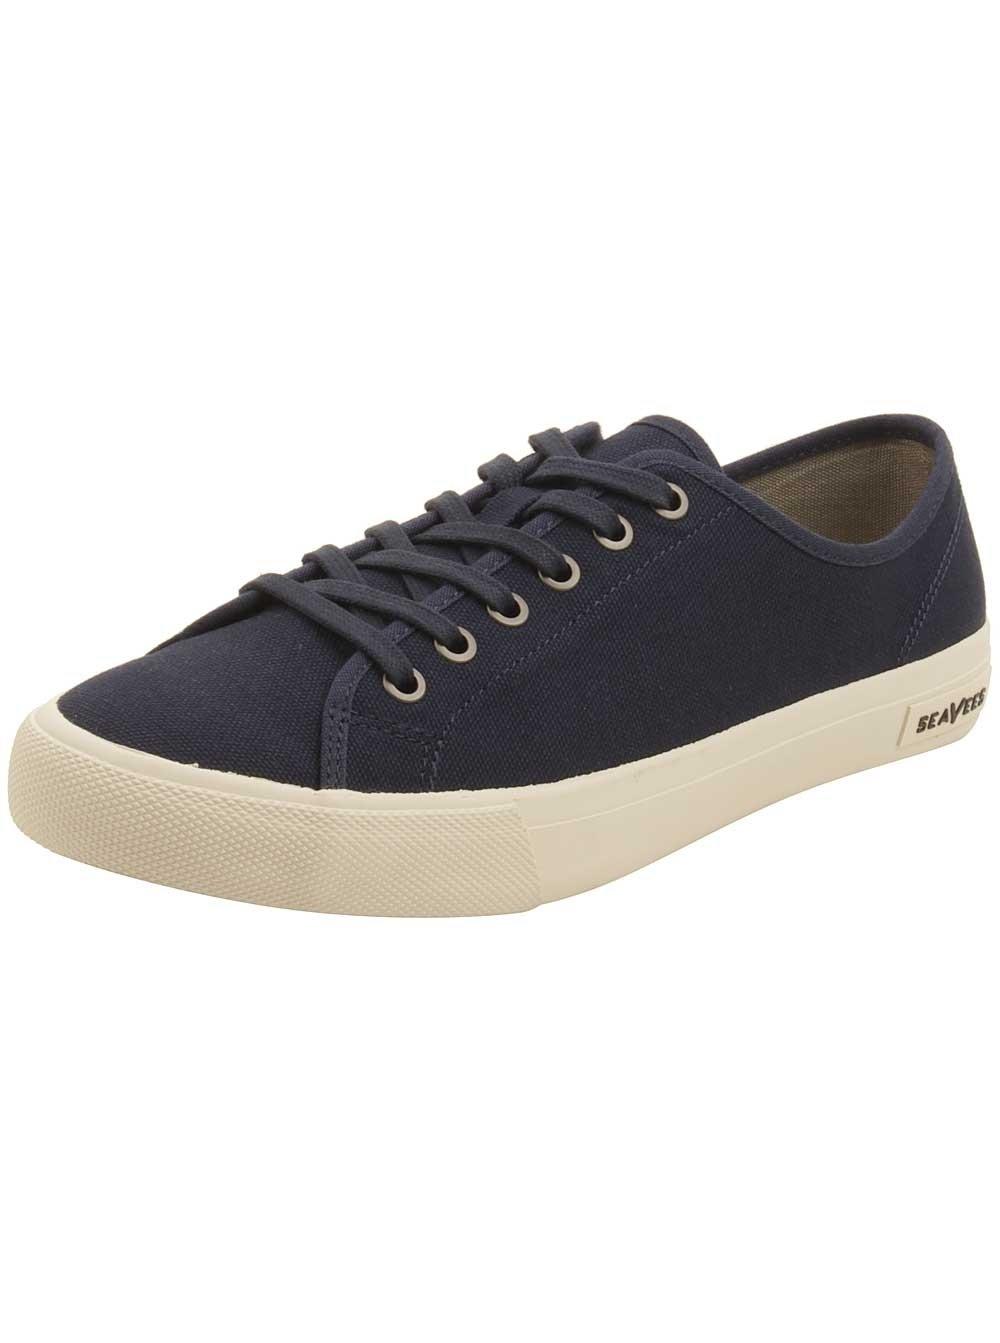 SeaVees Men's Monterey Standard Sneaker B078JW5764 14 D(M) US|Navy